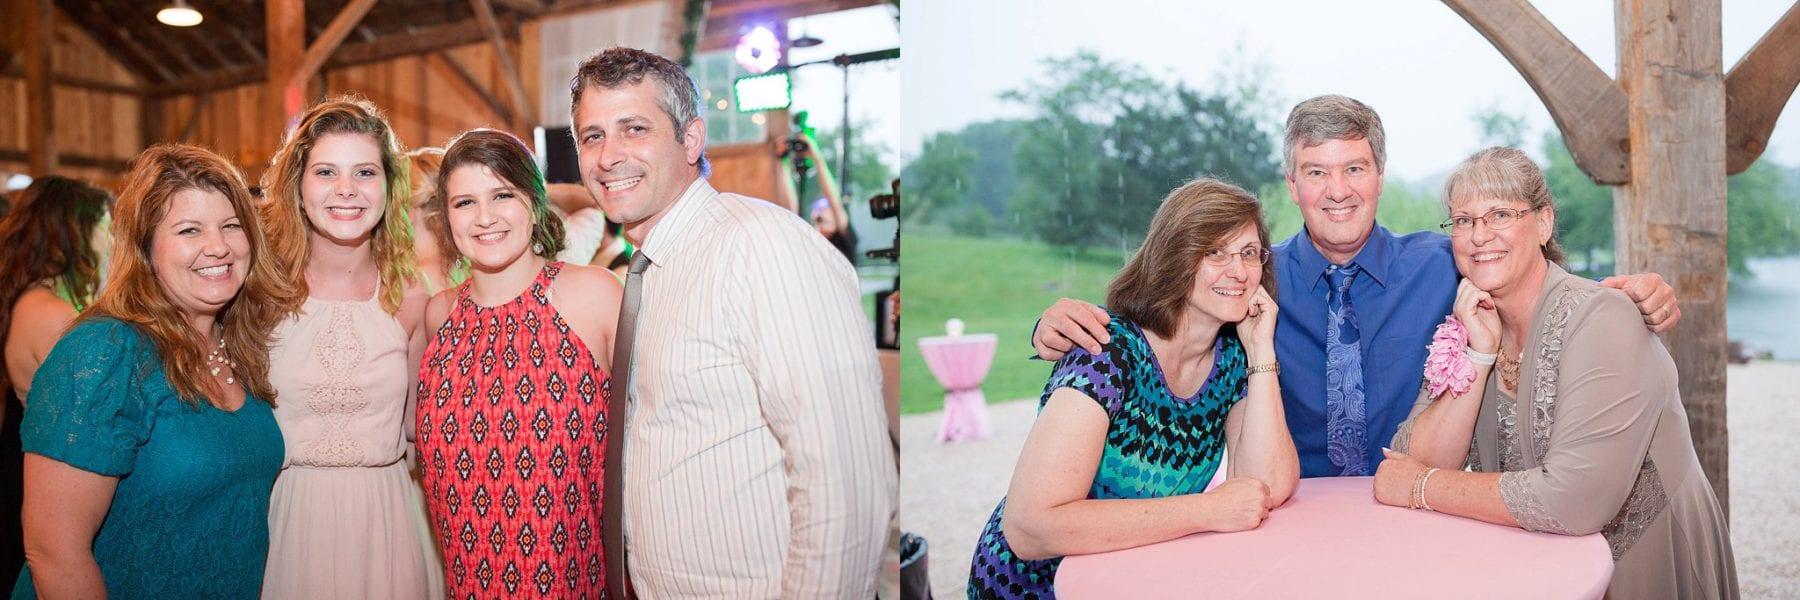 Justin & Megan Big Spring Farm Wedding Photos-511.jpg